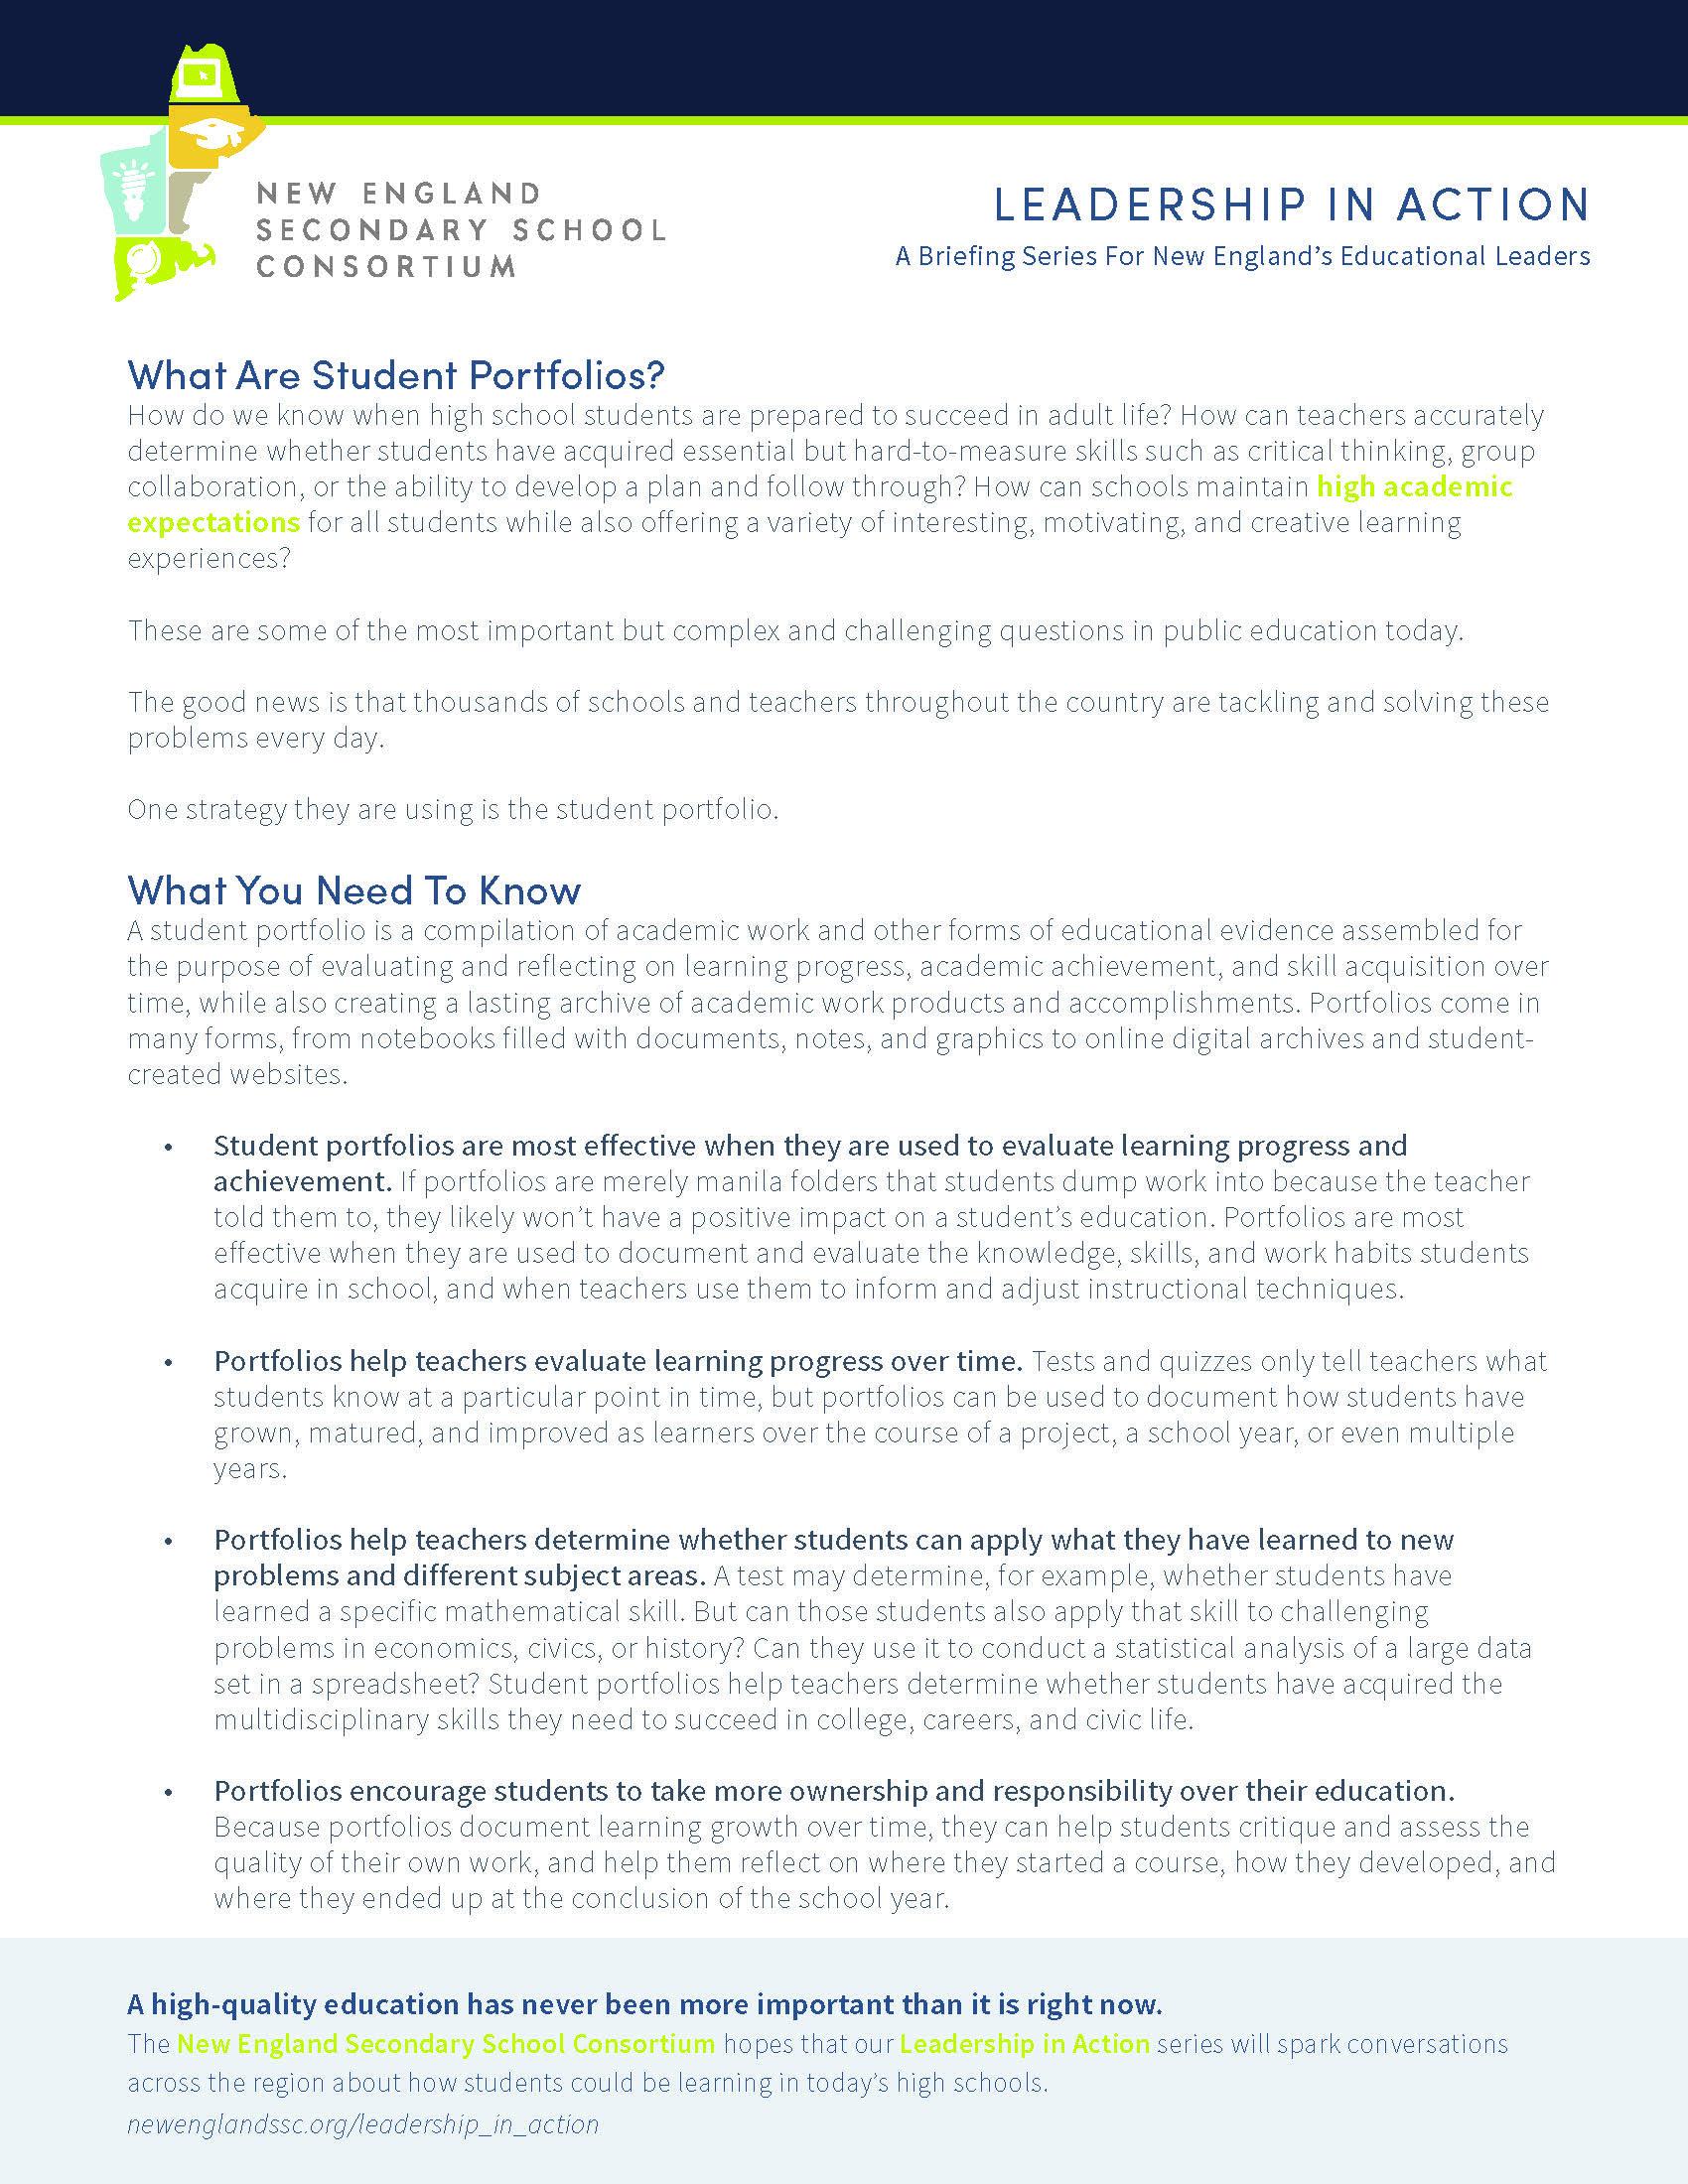 nessc_briefing_no15_whatareportfolios | Great Schools Partnership